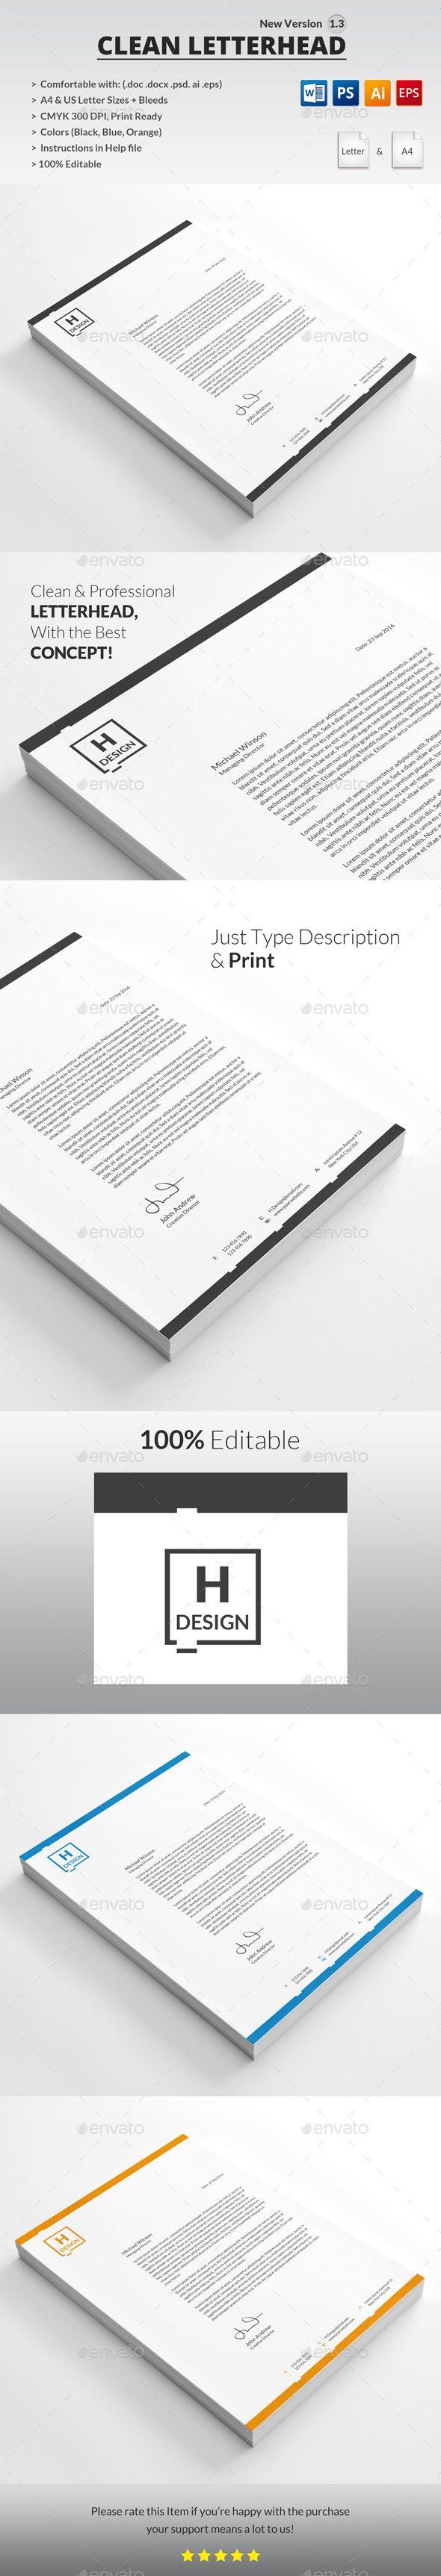 #Letterhead.Download here: http://graphicriver.net/item/letterhead/15394954?ref=arroganttype